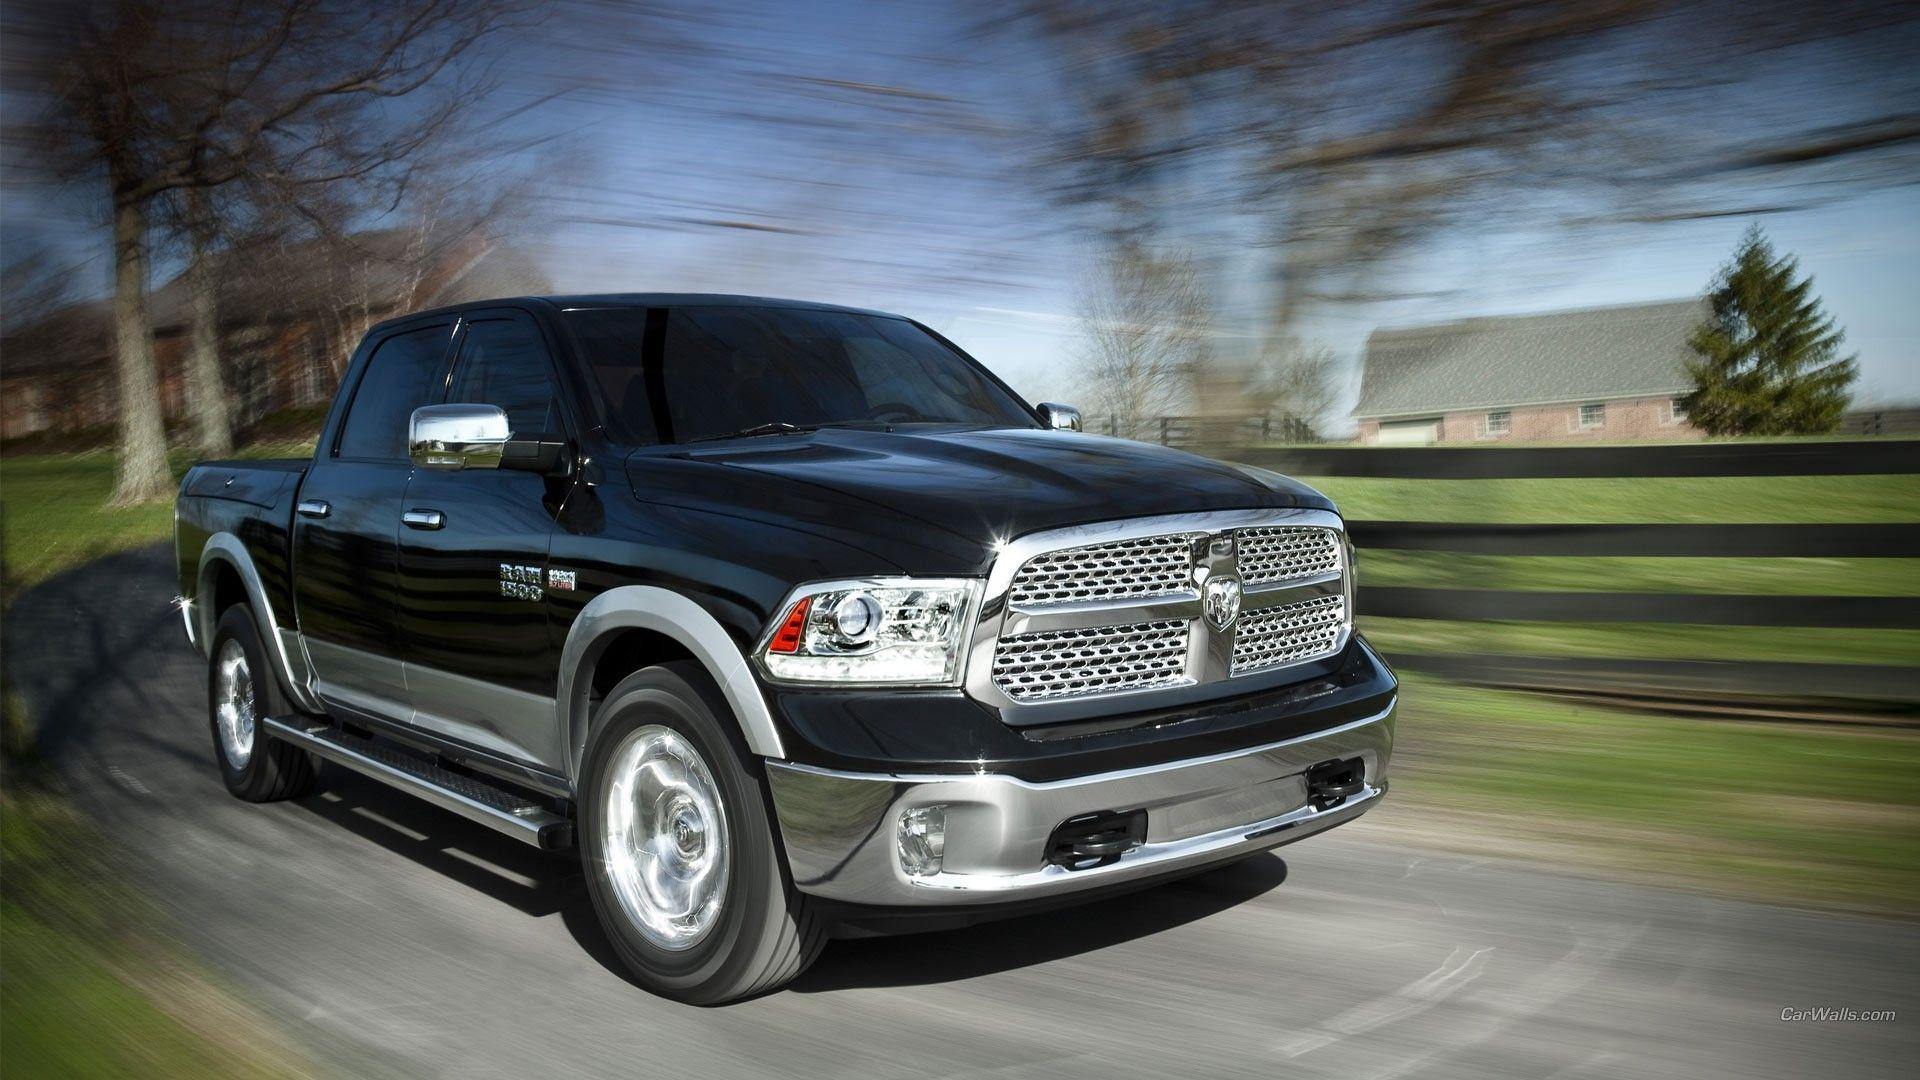 Dodge Ram picture